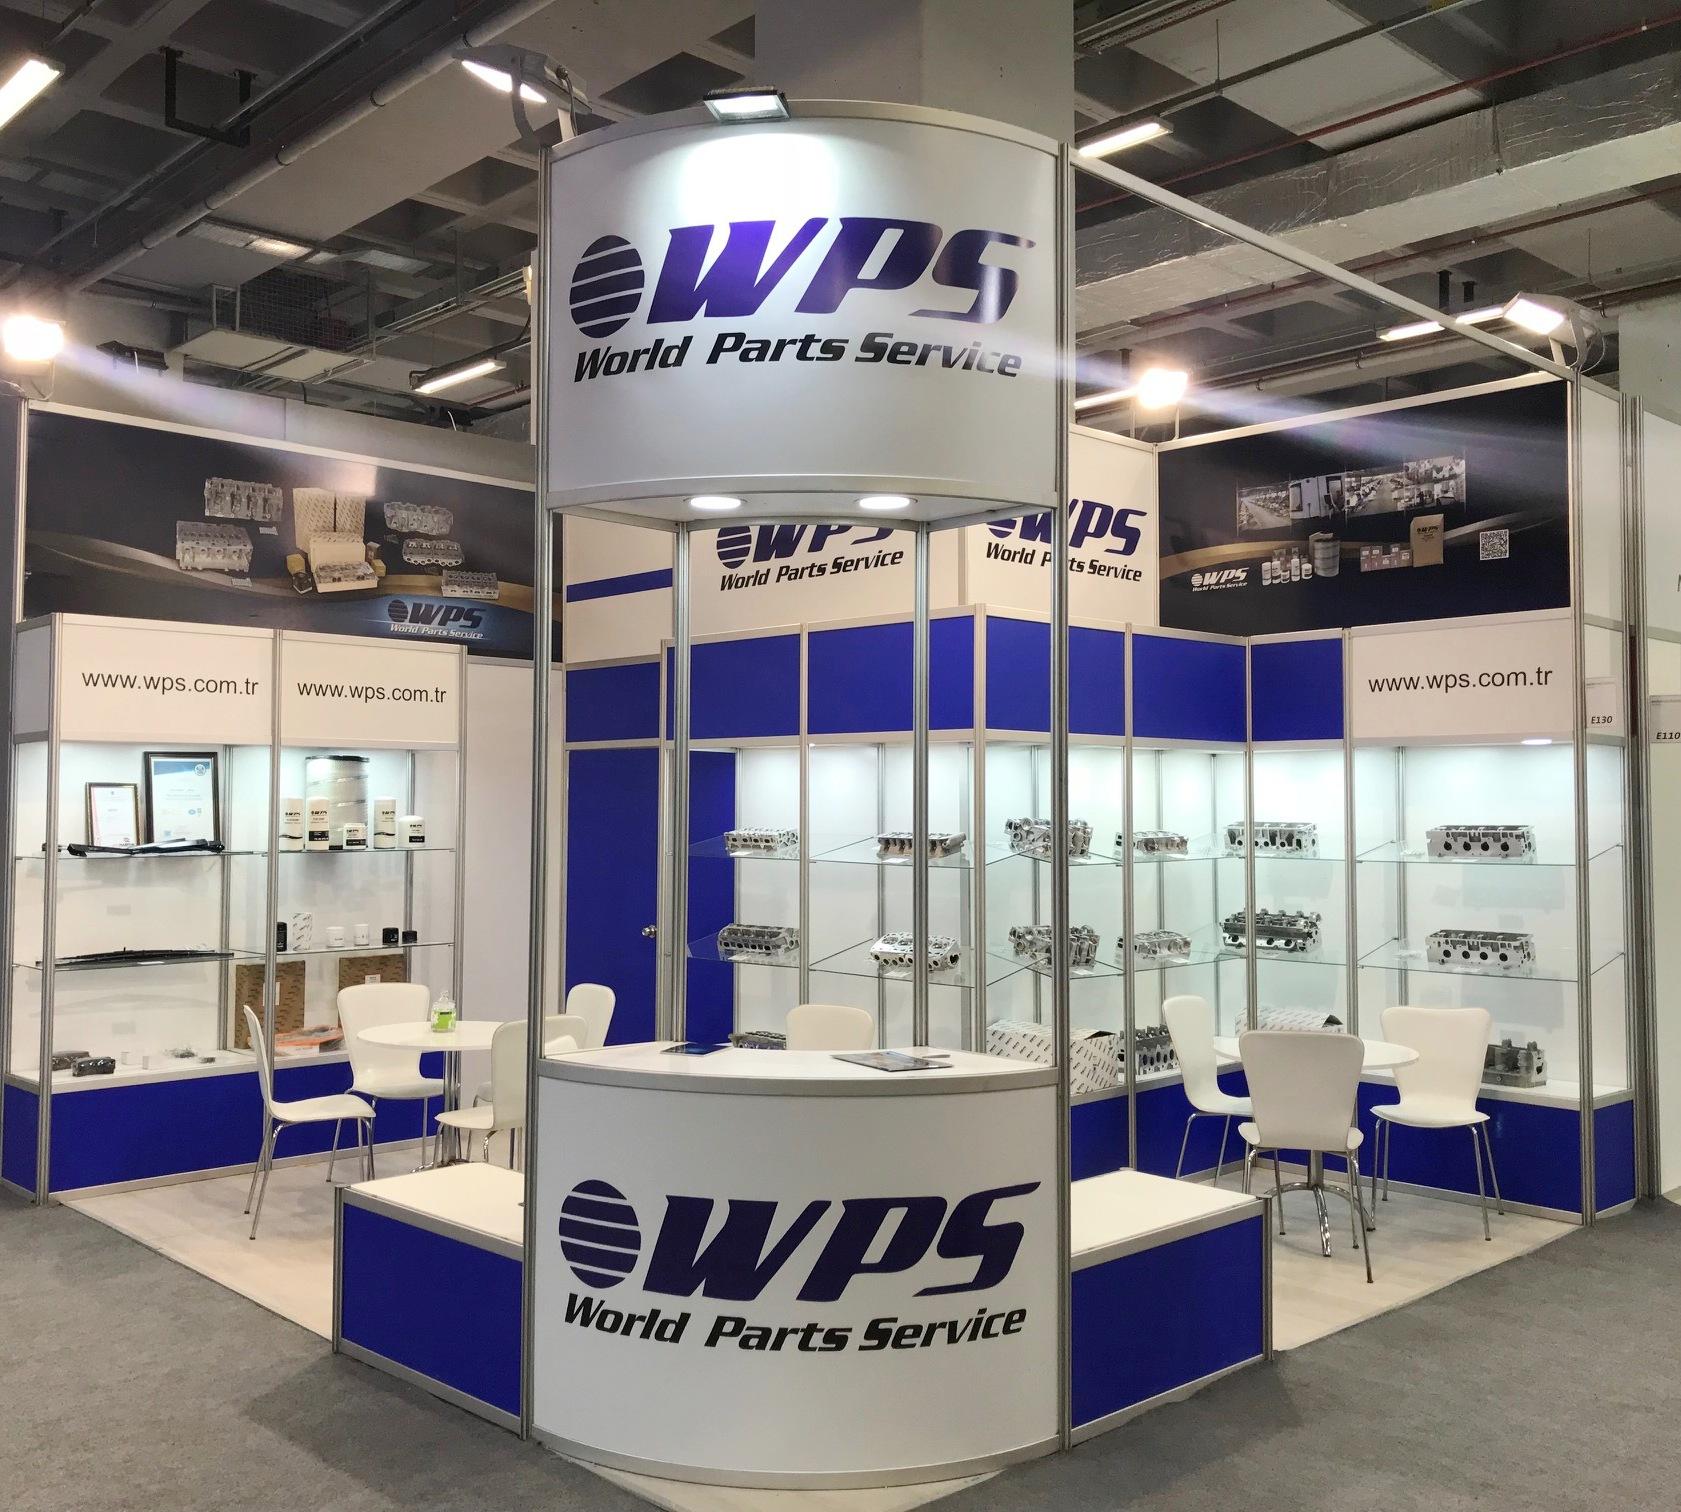 AUTOMECHANİKA İSTANBUL 2018 || WPS Word Parts Service